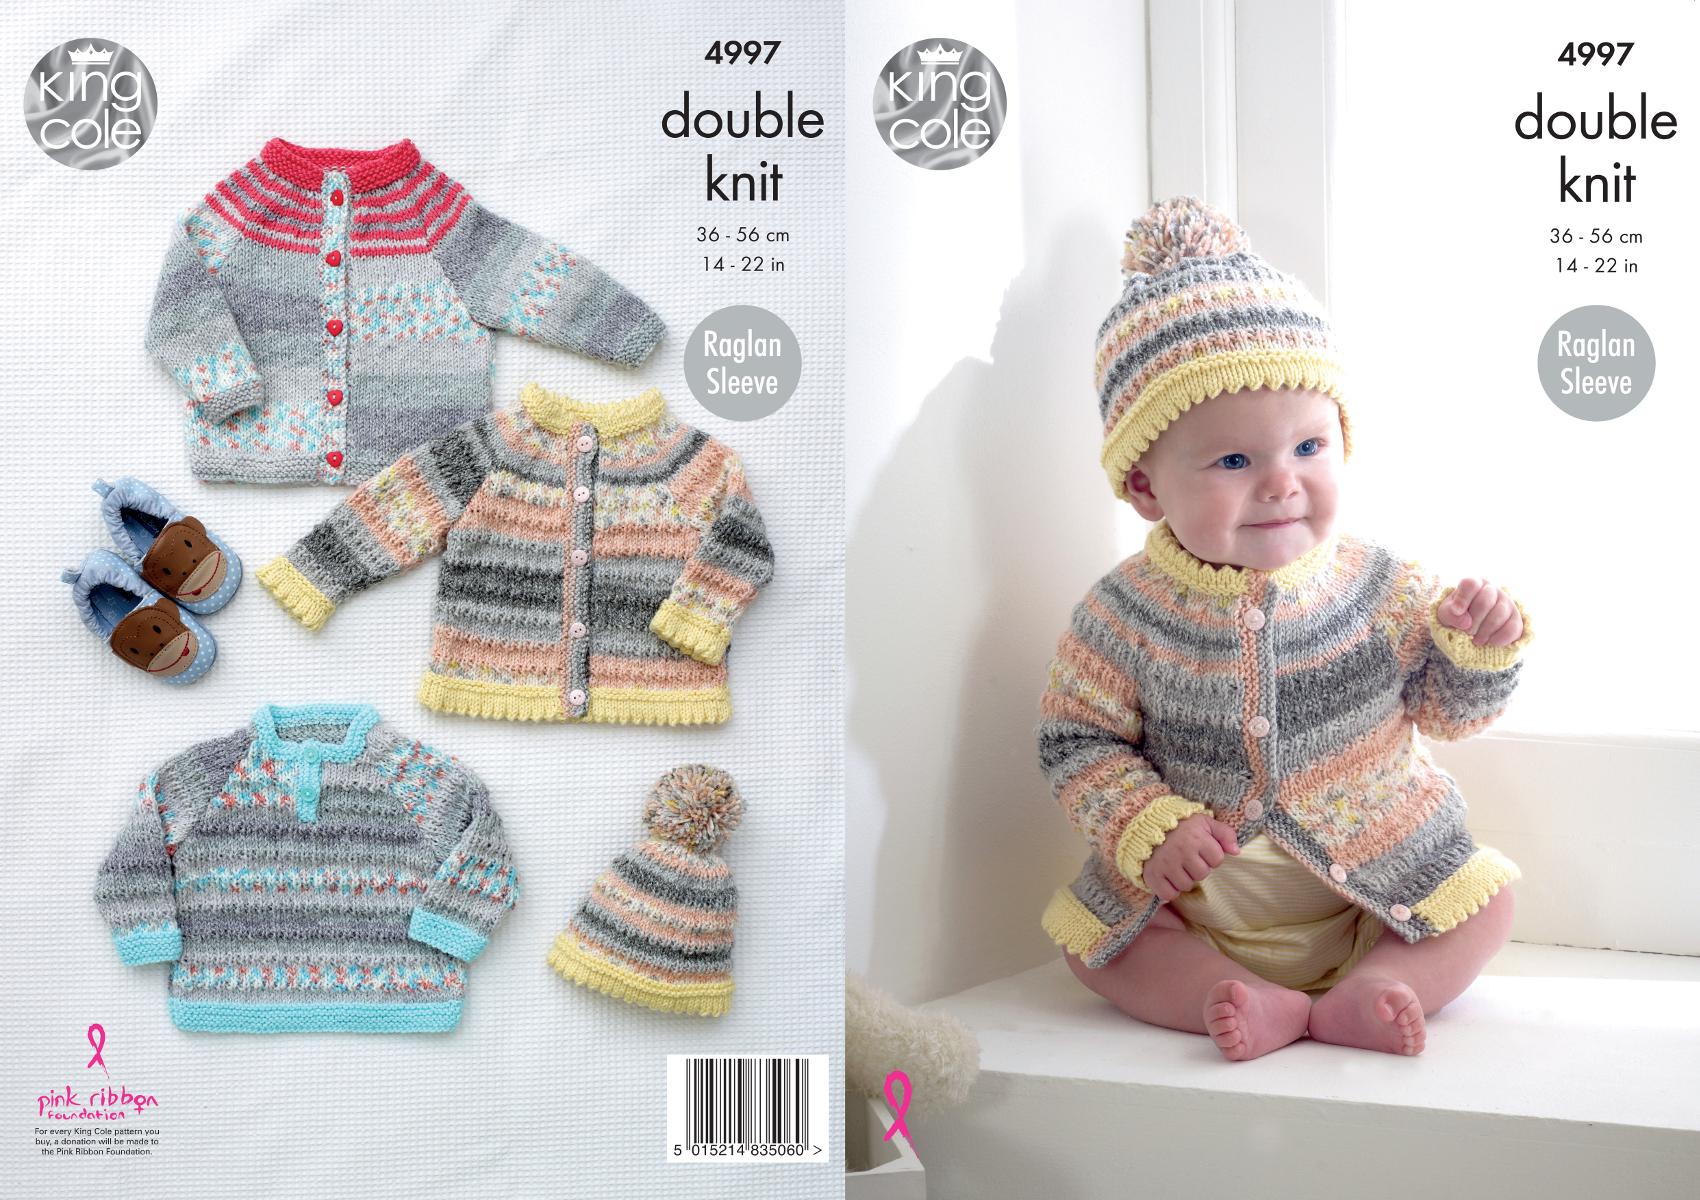 Baby double knitting pattern raglan sleeve cardigans sweater hat baby double knitting pattern raglan sleeve cardigans sweater hat king cole 4997 bankloansurffo Choice Image